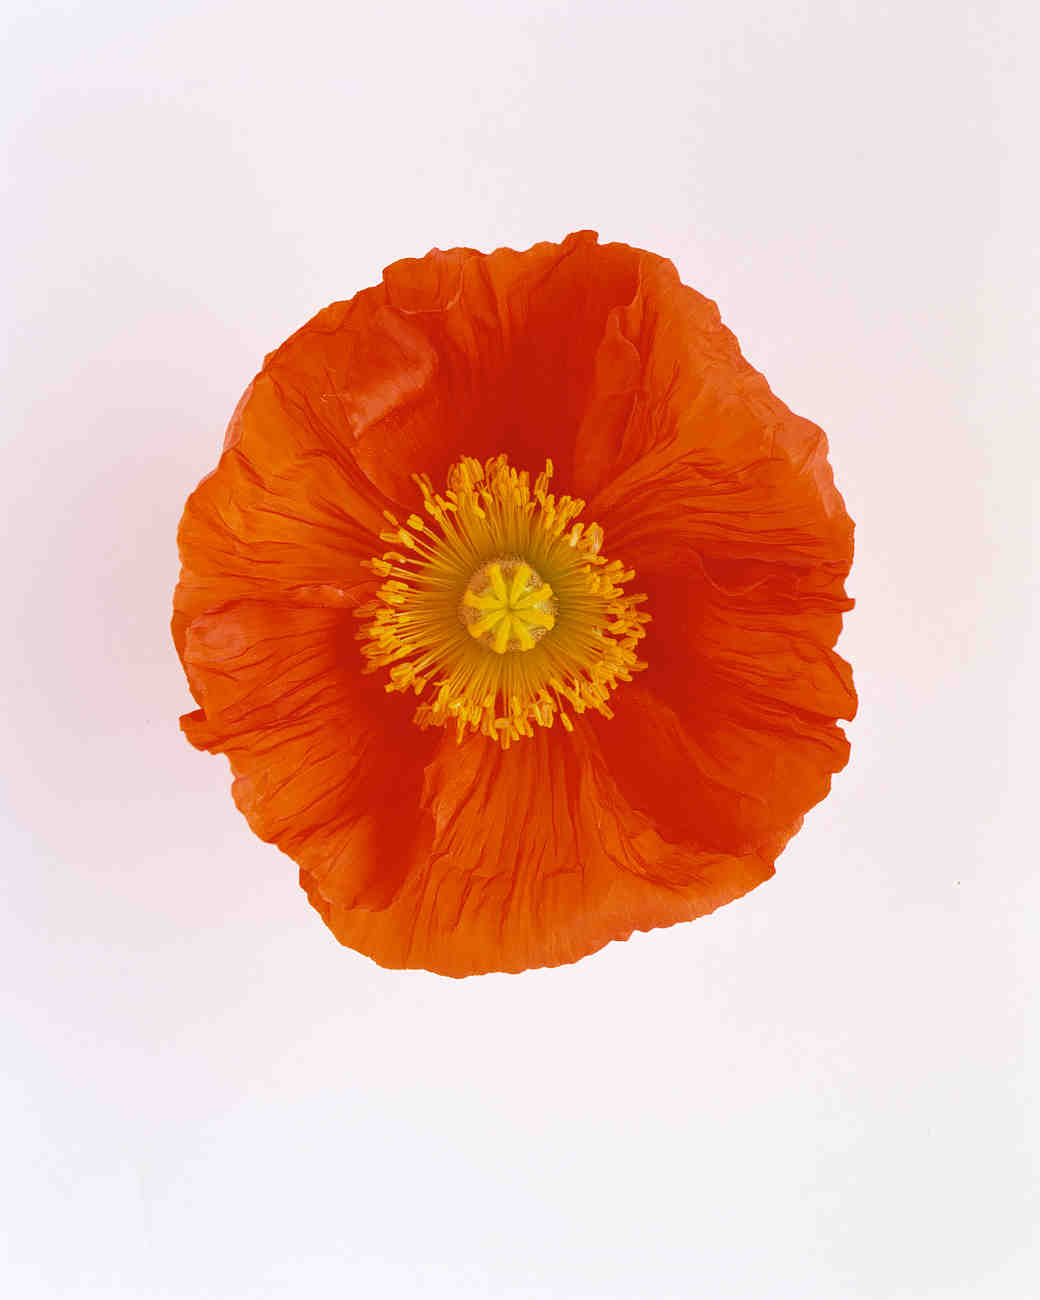 flower-glossary-poppy-happy-or-simona-red-a98432-0415.jpg